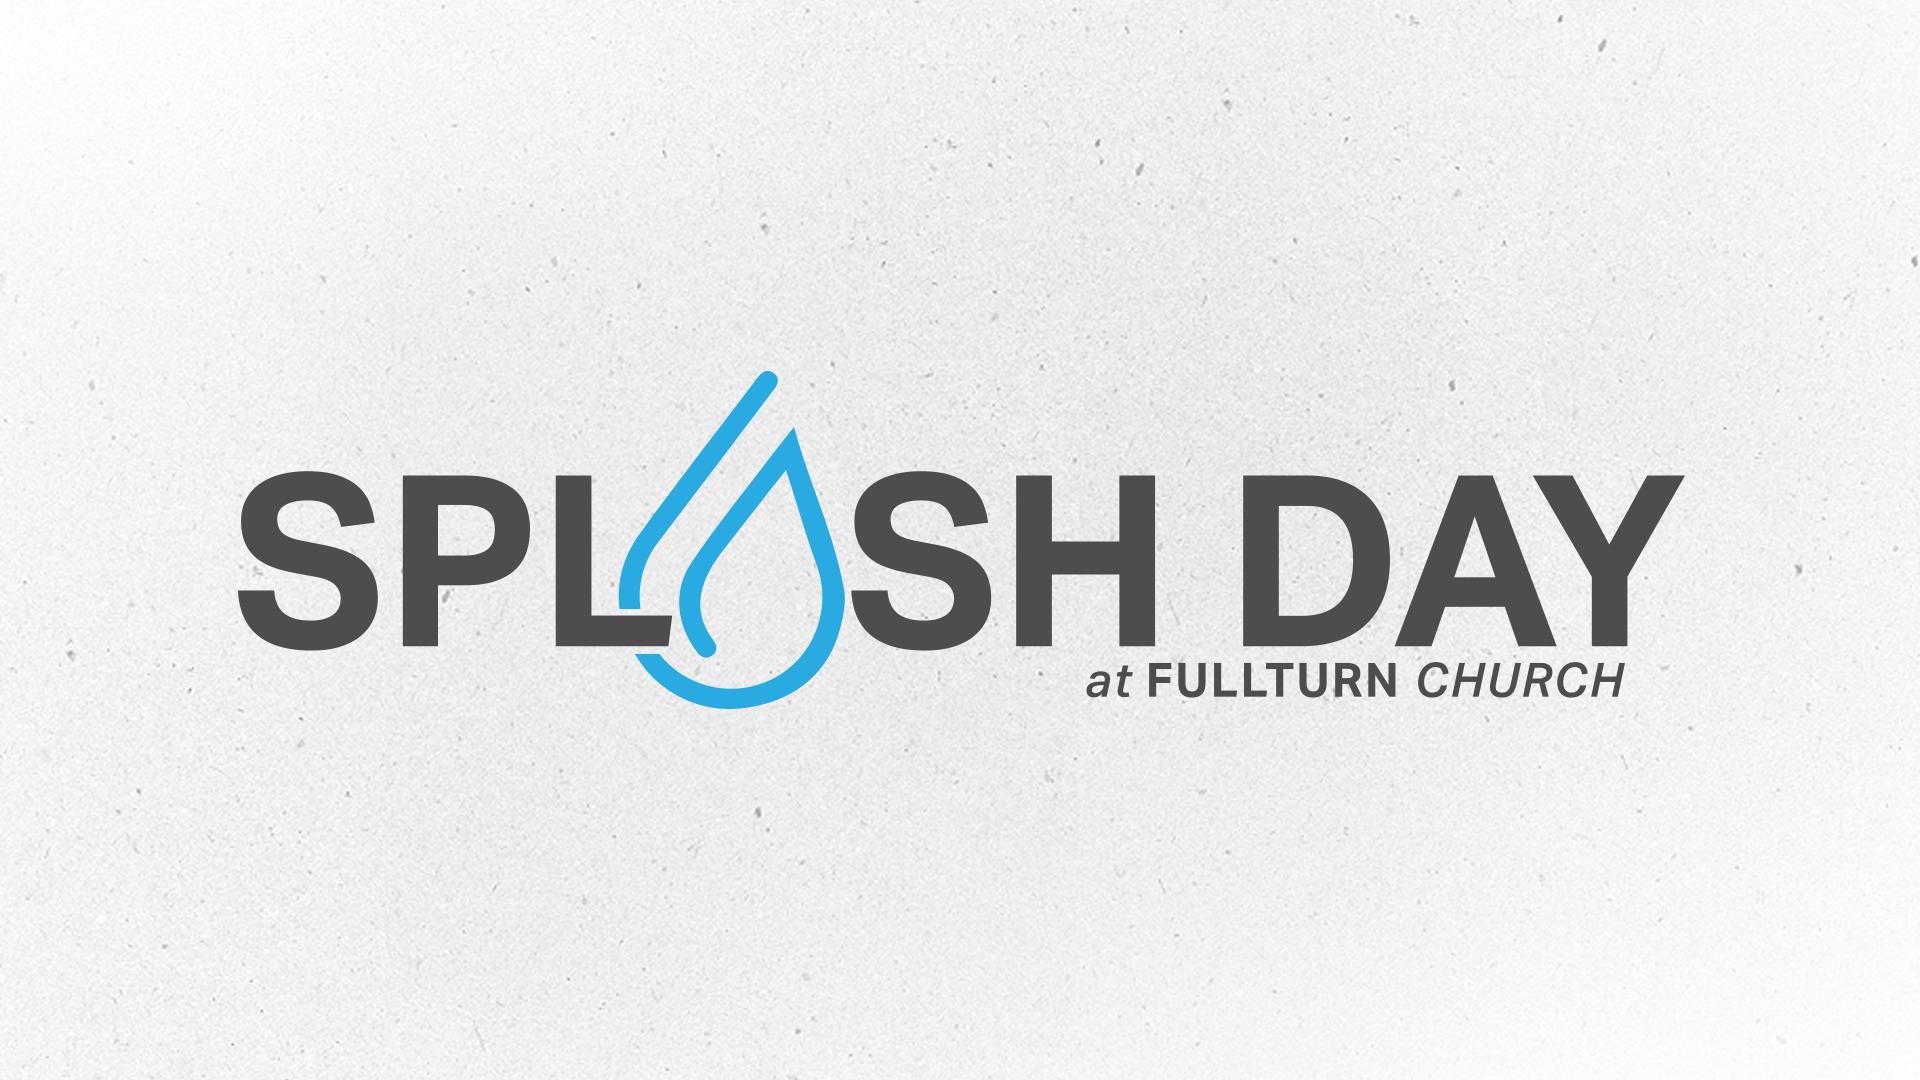 Splash day screen